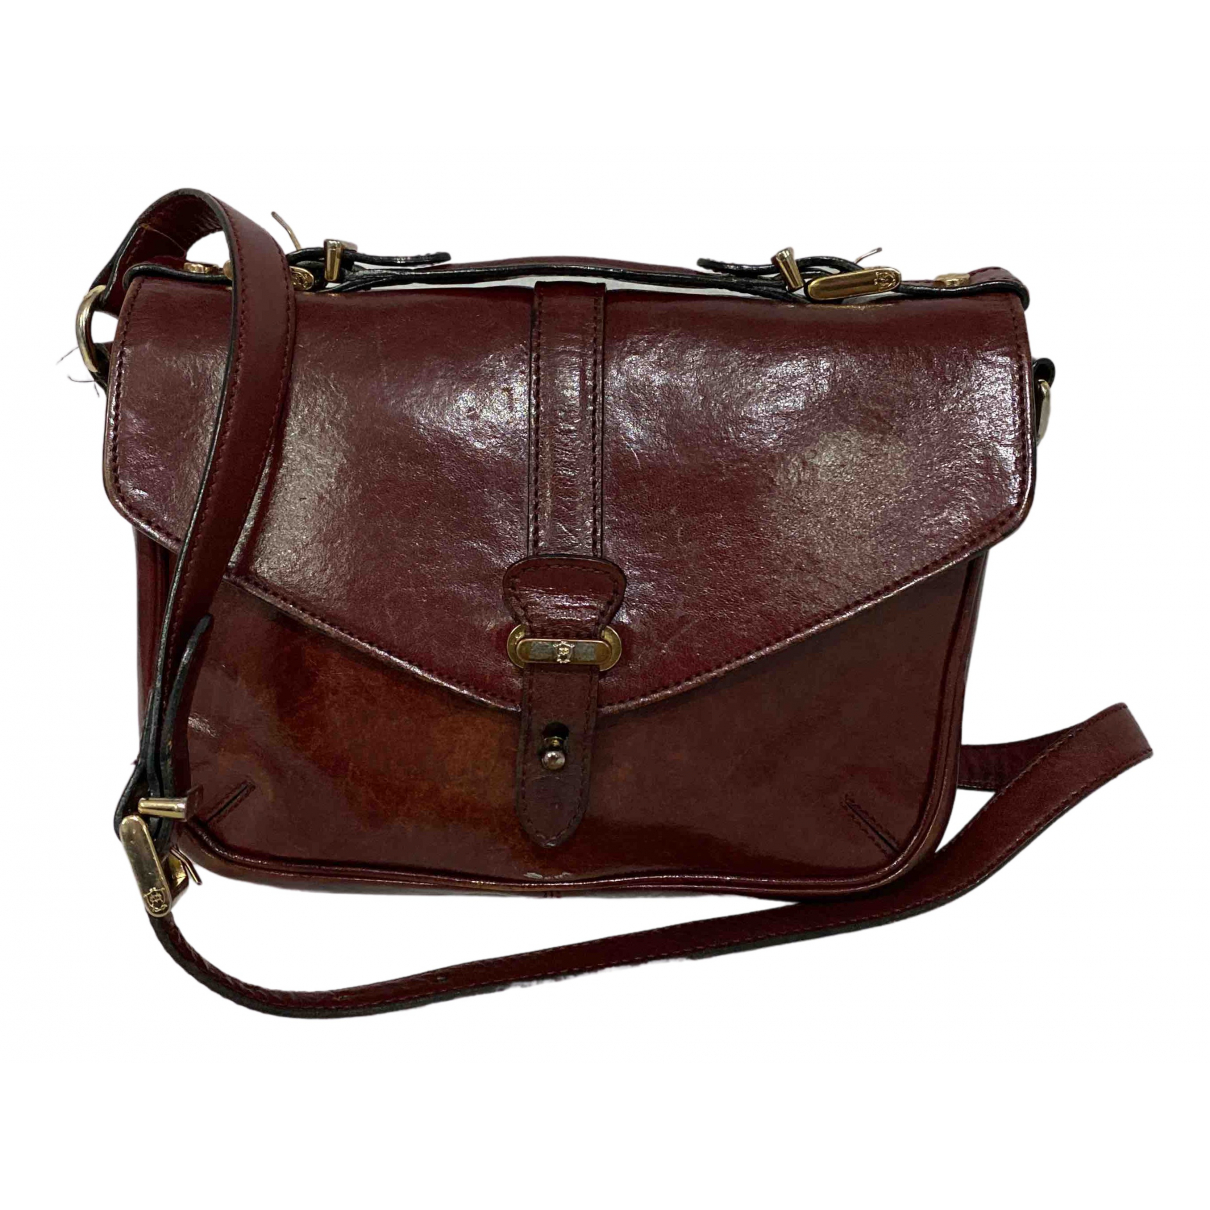 Massimo Dutti N Burgundy Leather handbag for Women N